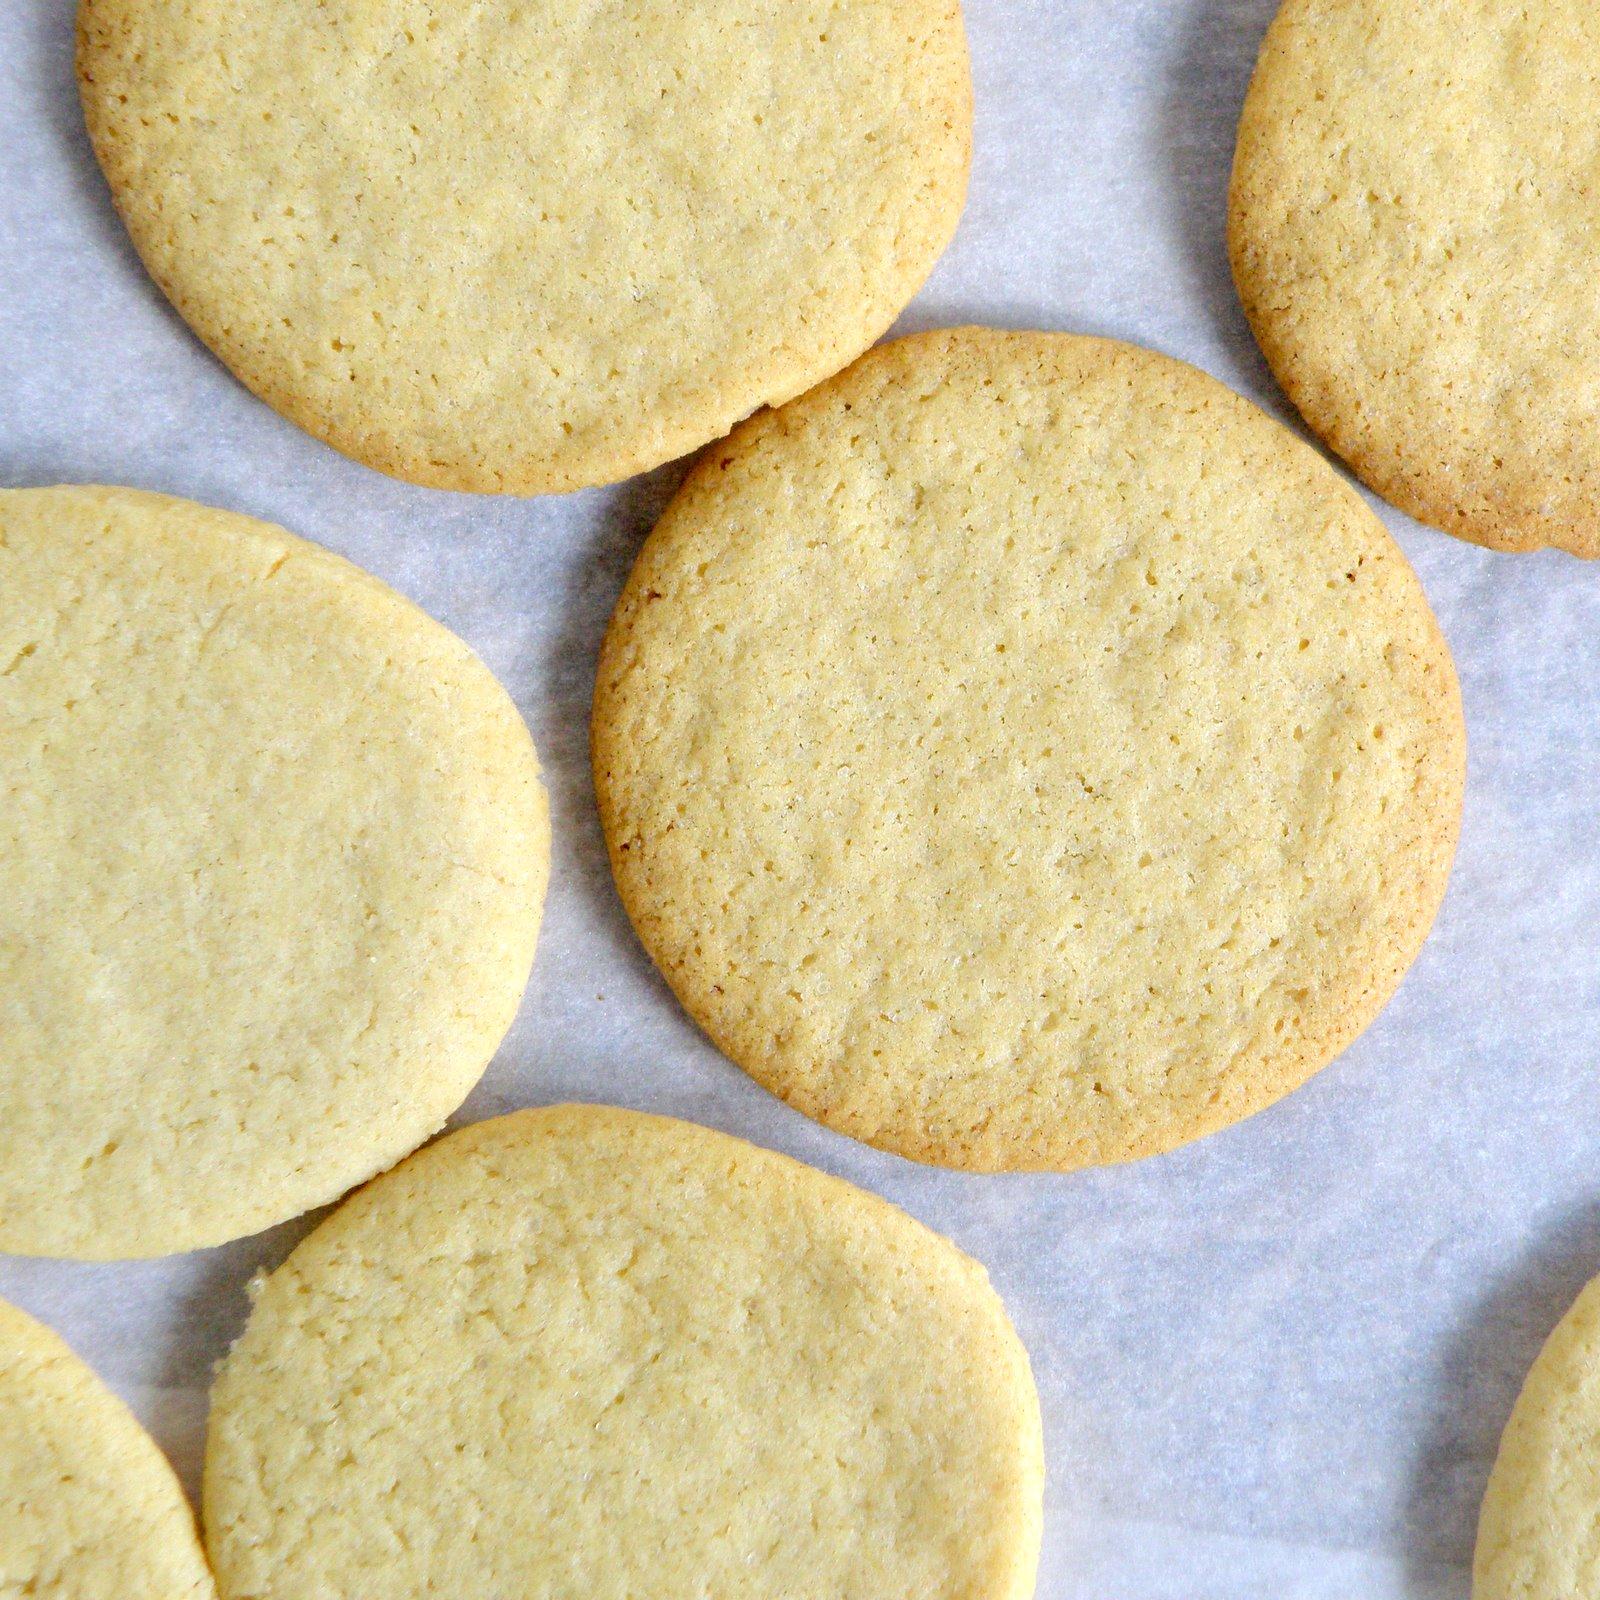 deli-cute-essen: Vegan Sugar Cookie Ice Cream Sandwiches